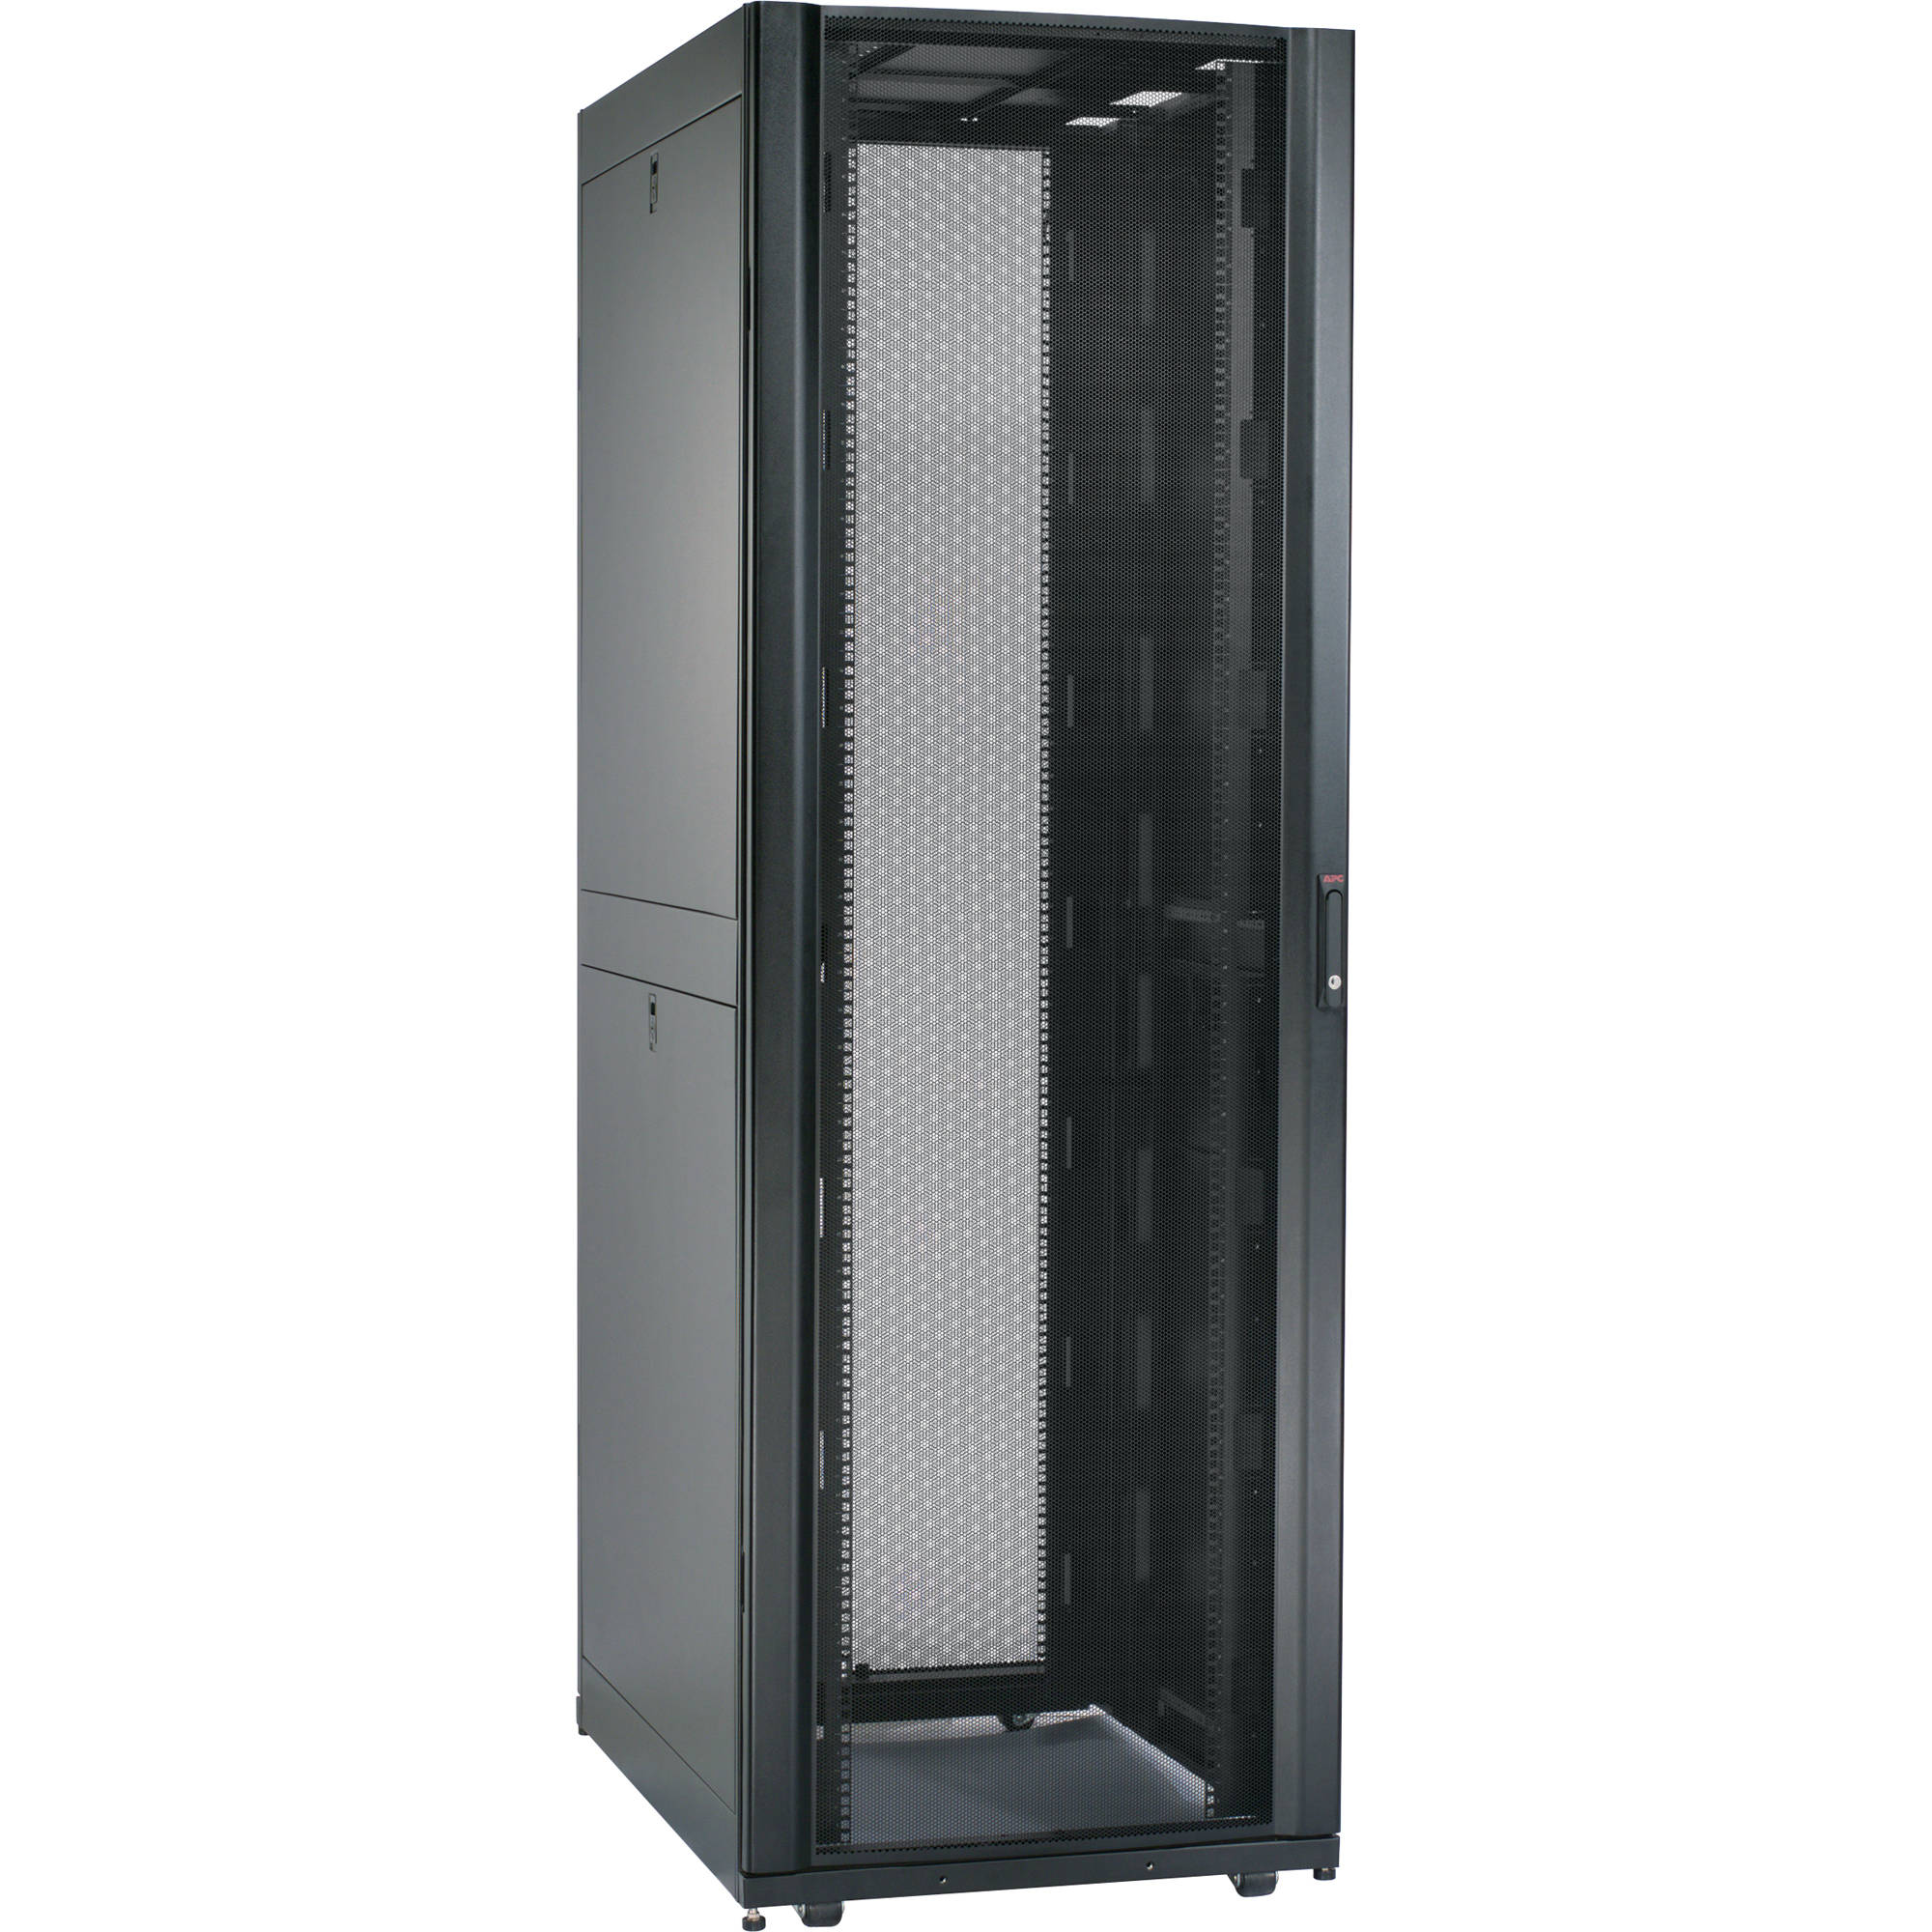 server telecommunication cabinet rack corxjcdgasru product for network equipments racks china